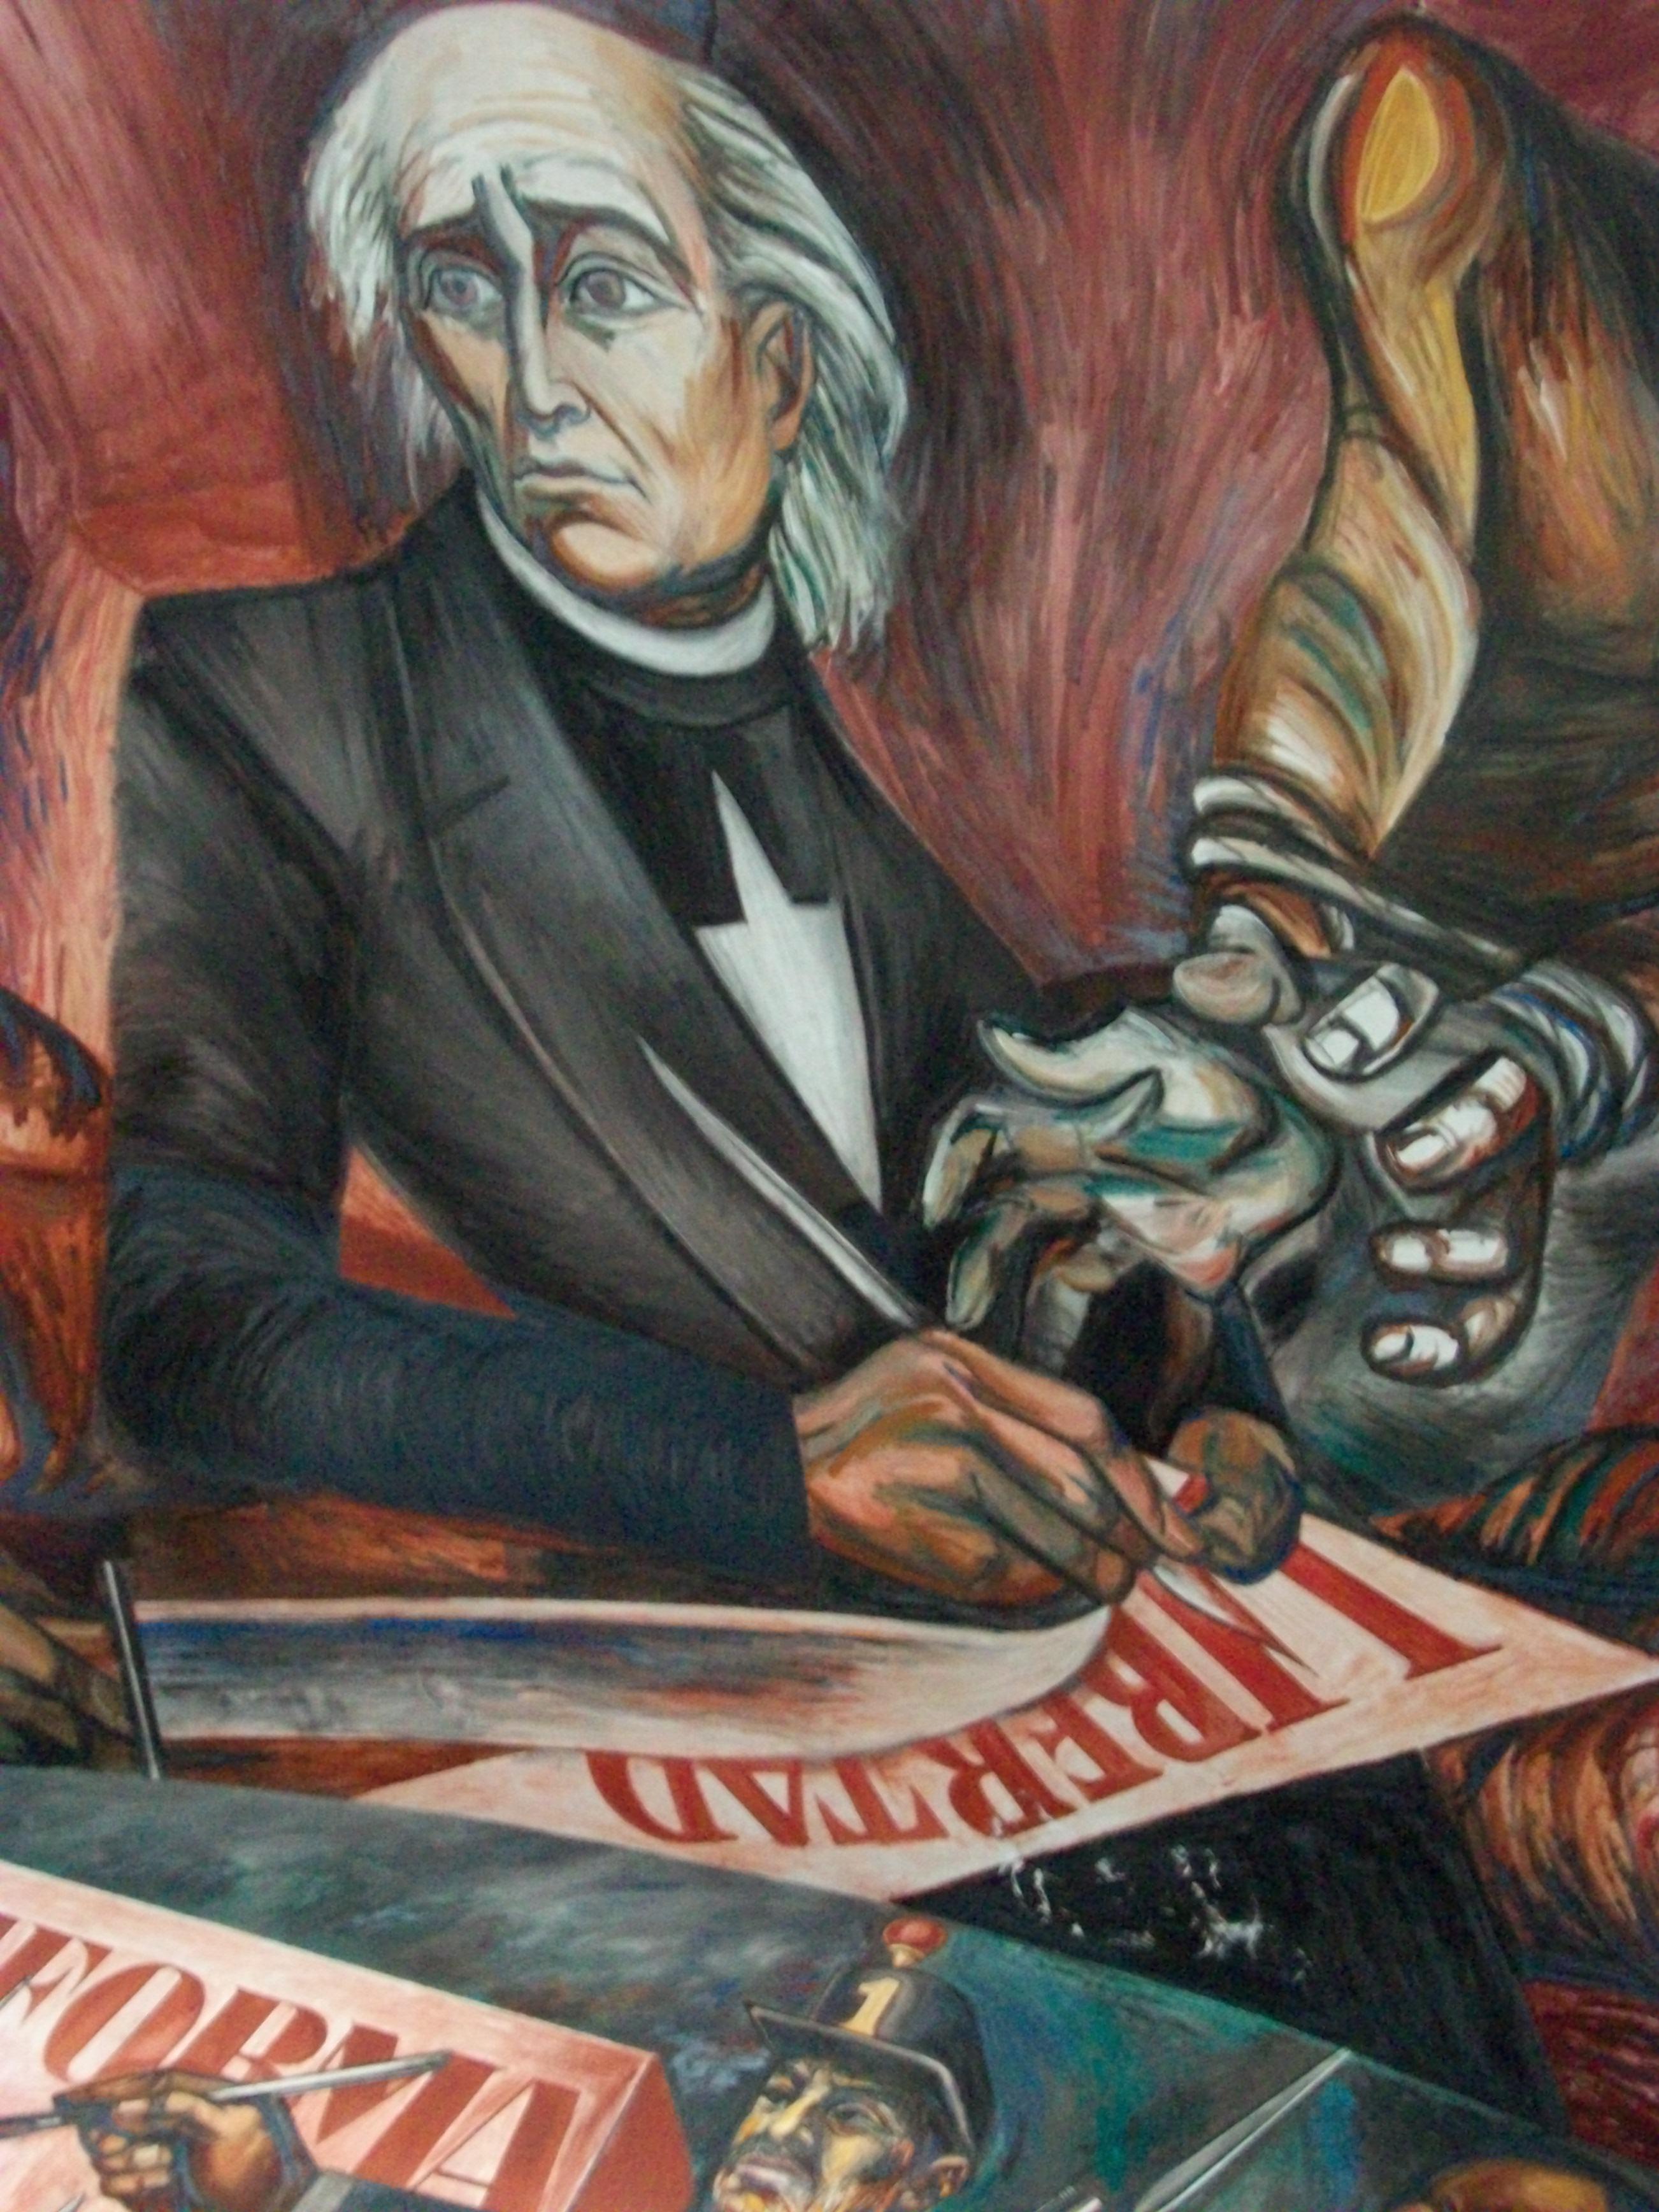 La gran legislaci n revolucionaria mexicana y la for El mural guadalajara